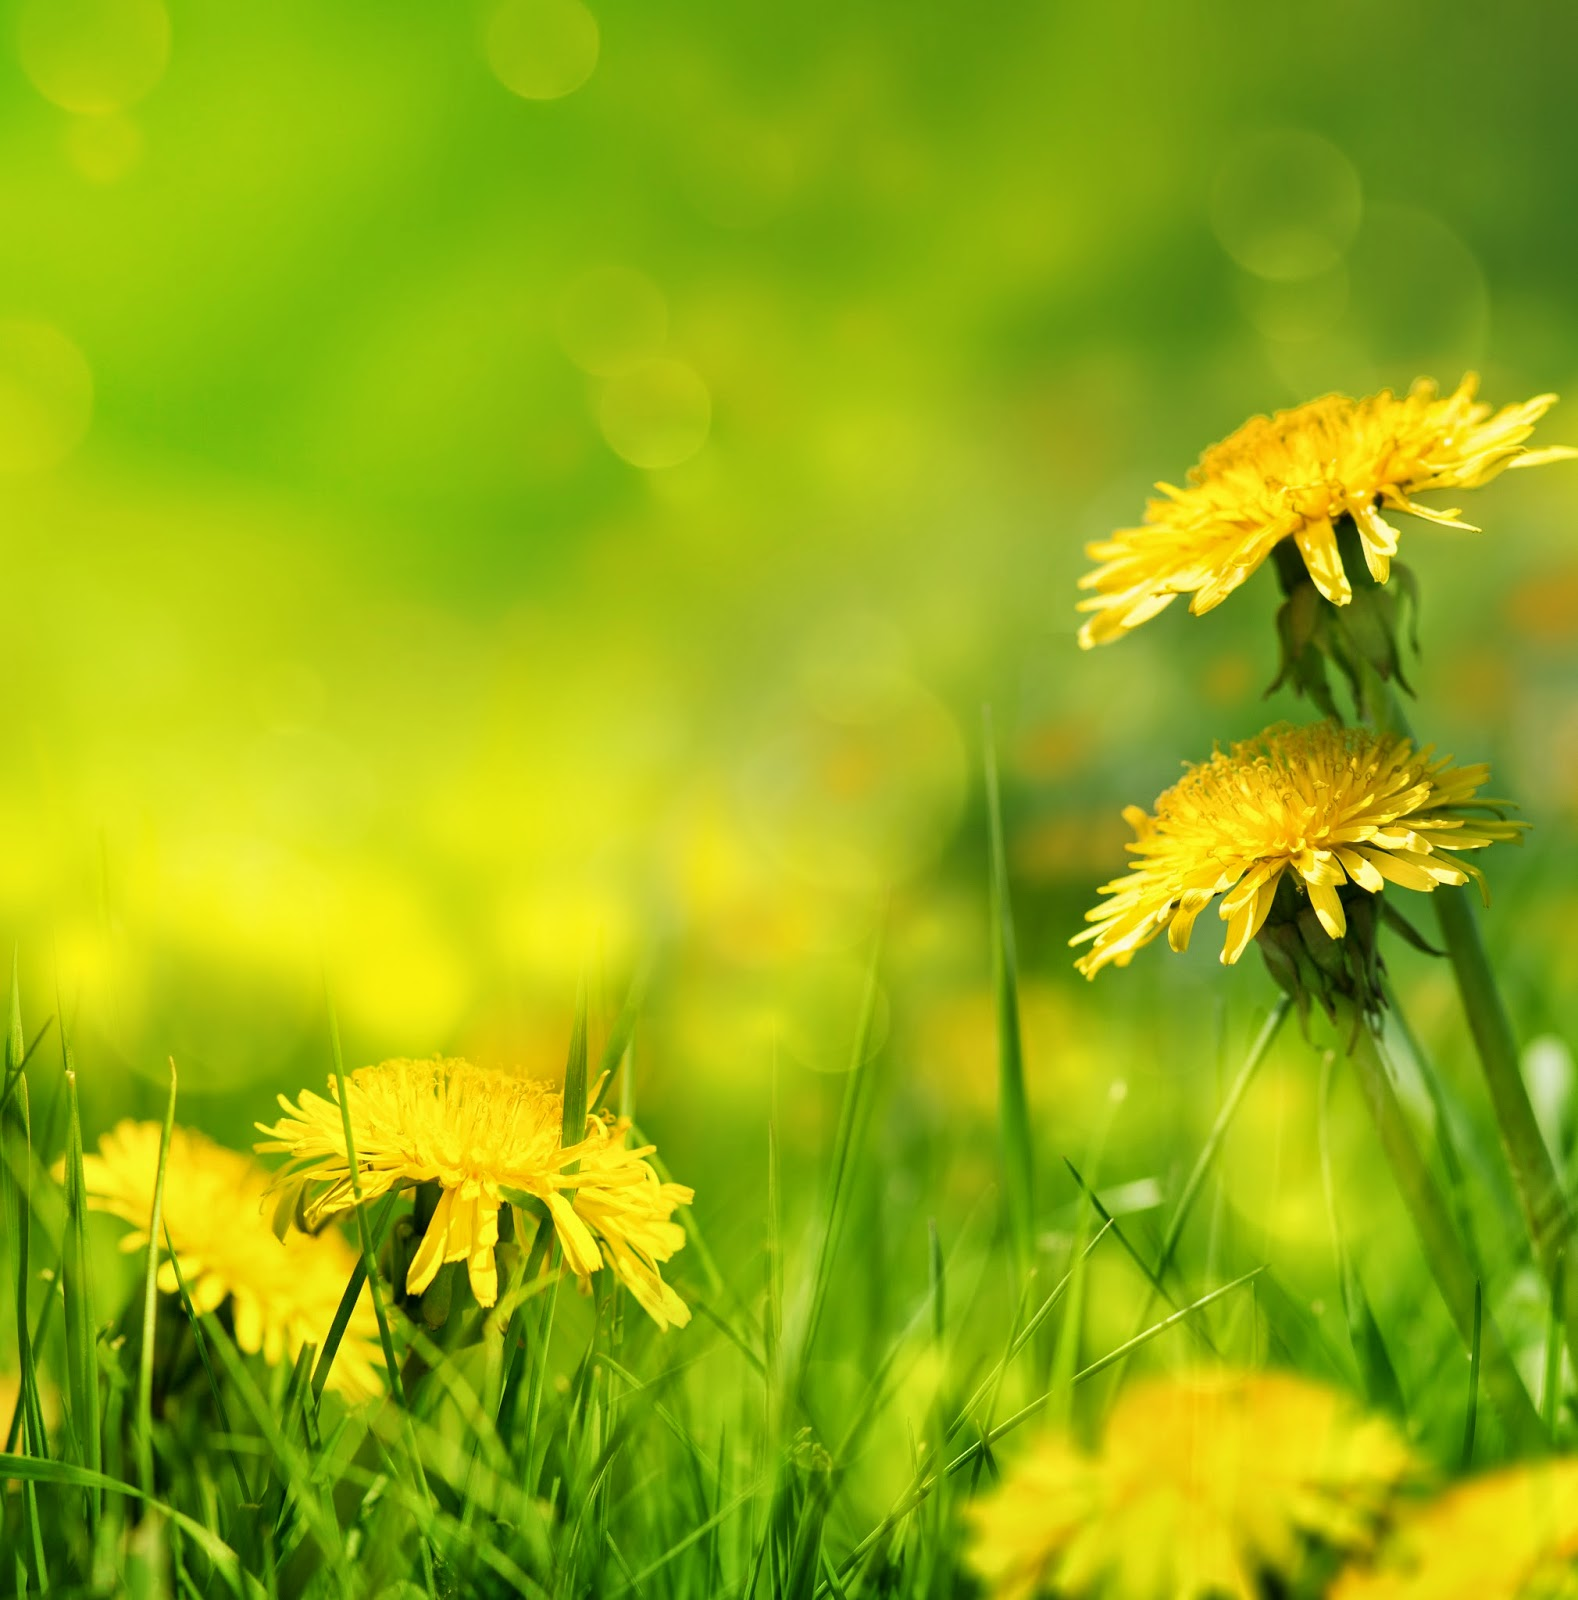 Imagenes fotograficas imagenes bonitas de flores para for Fotos para poner de fondo de pantalla